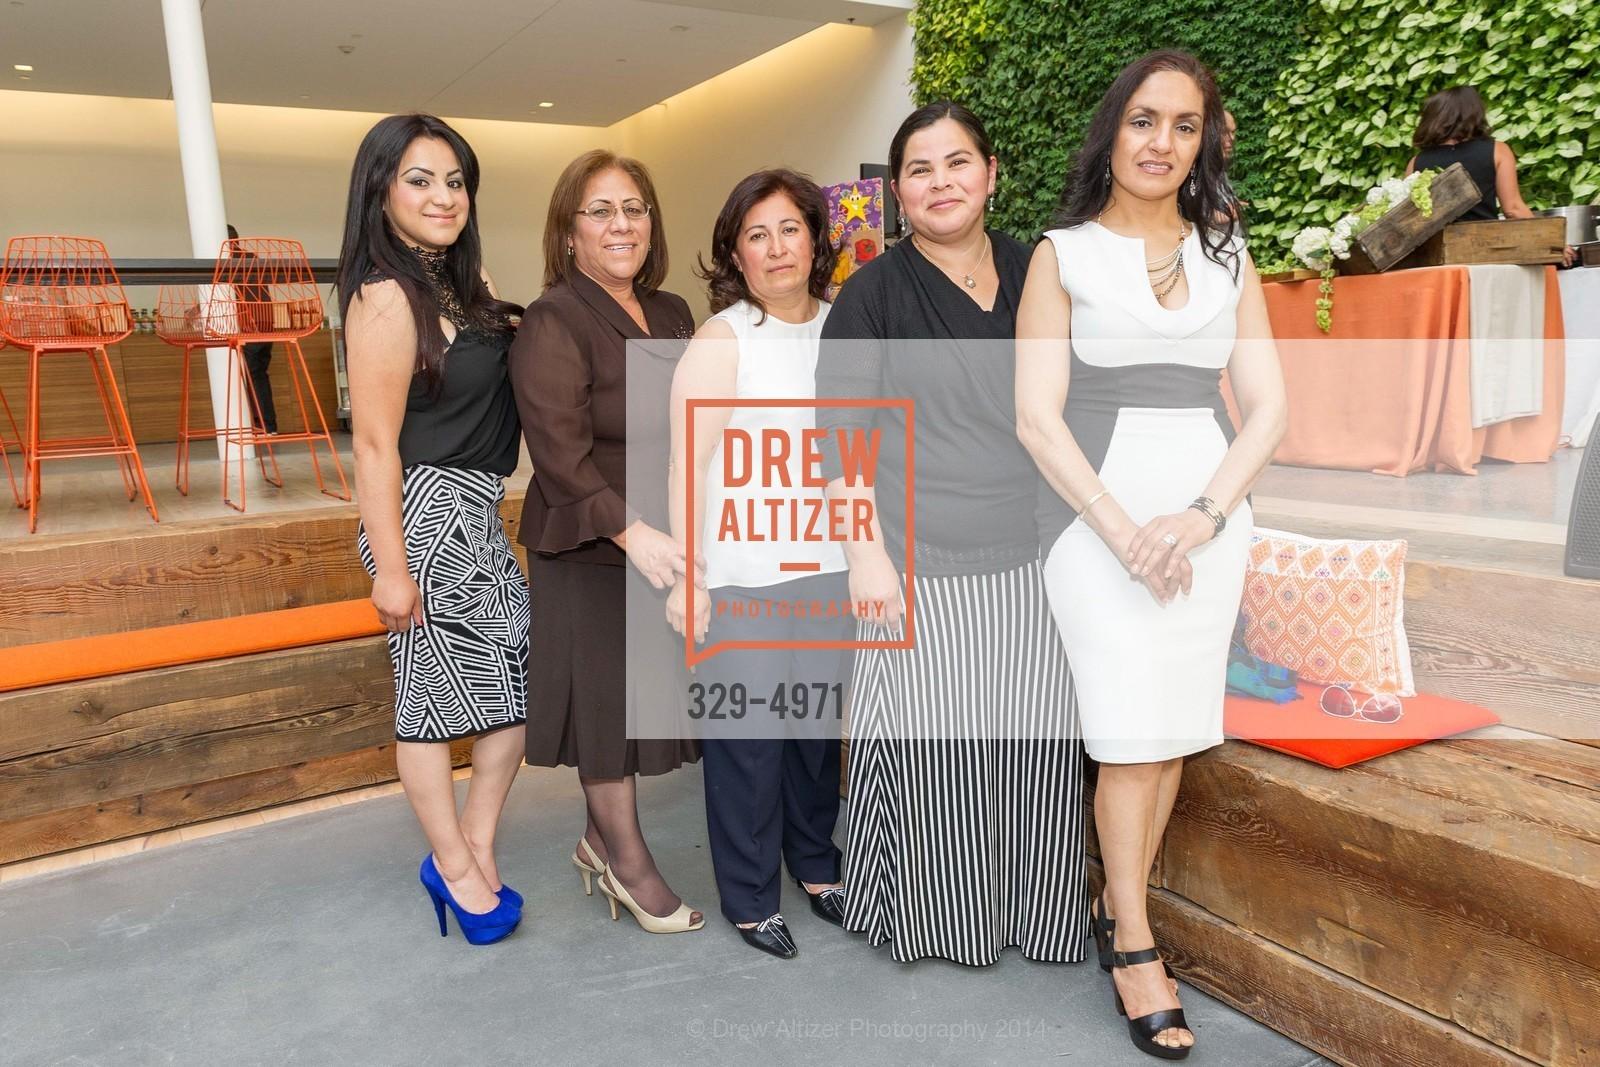 Brenda Juarez, Guadalupe Guerrero, Isabel Pasos, Vinsa Lugo, Rosa Ortiz, Photo #329-4971